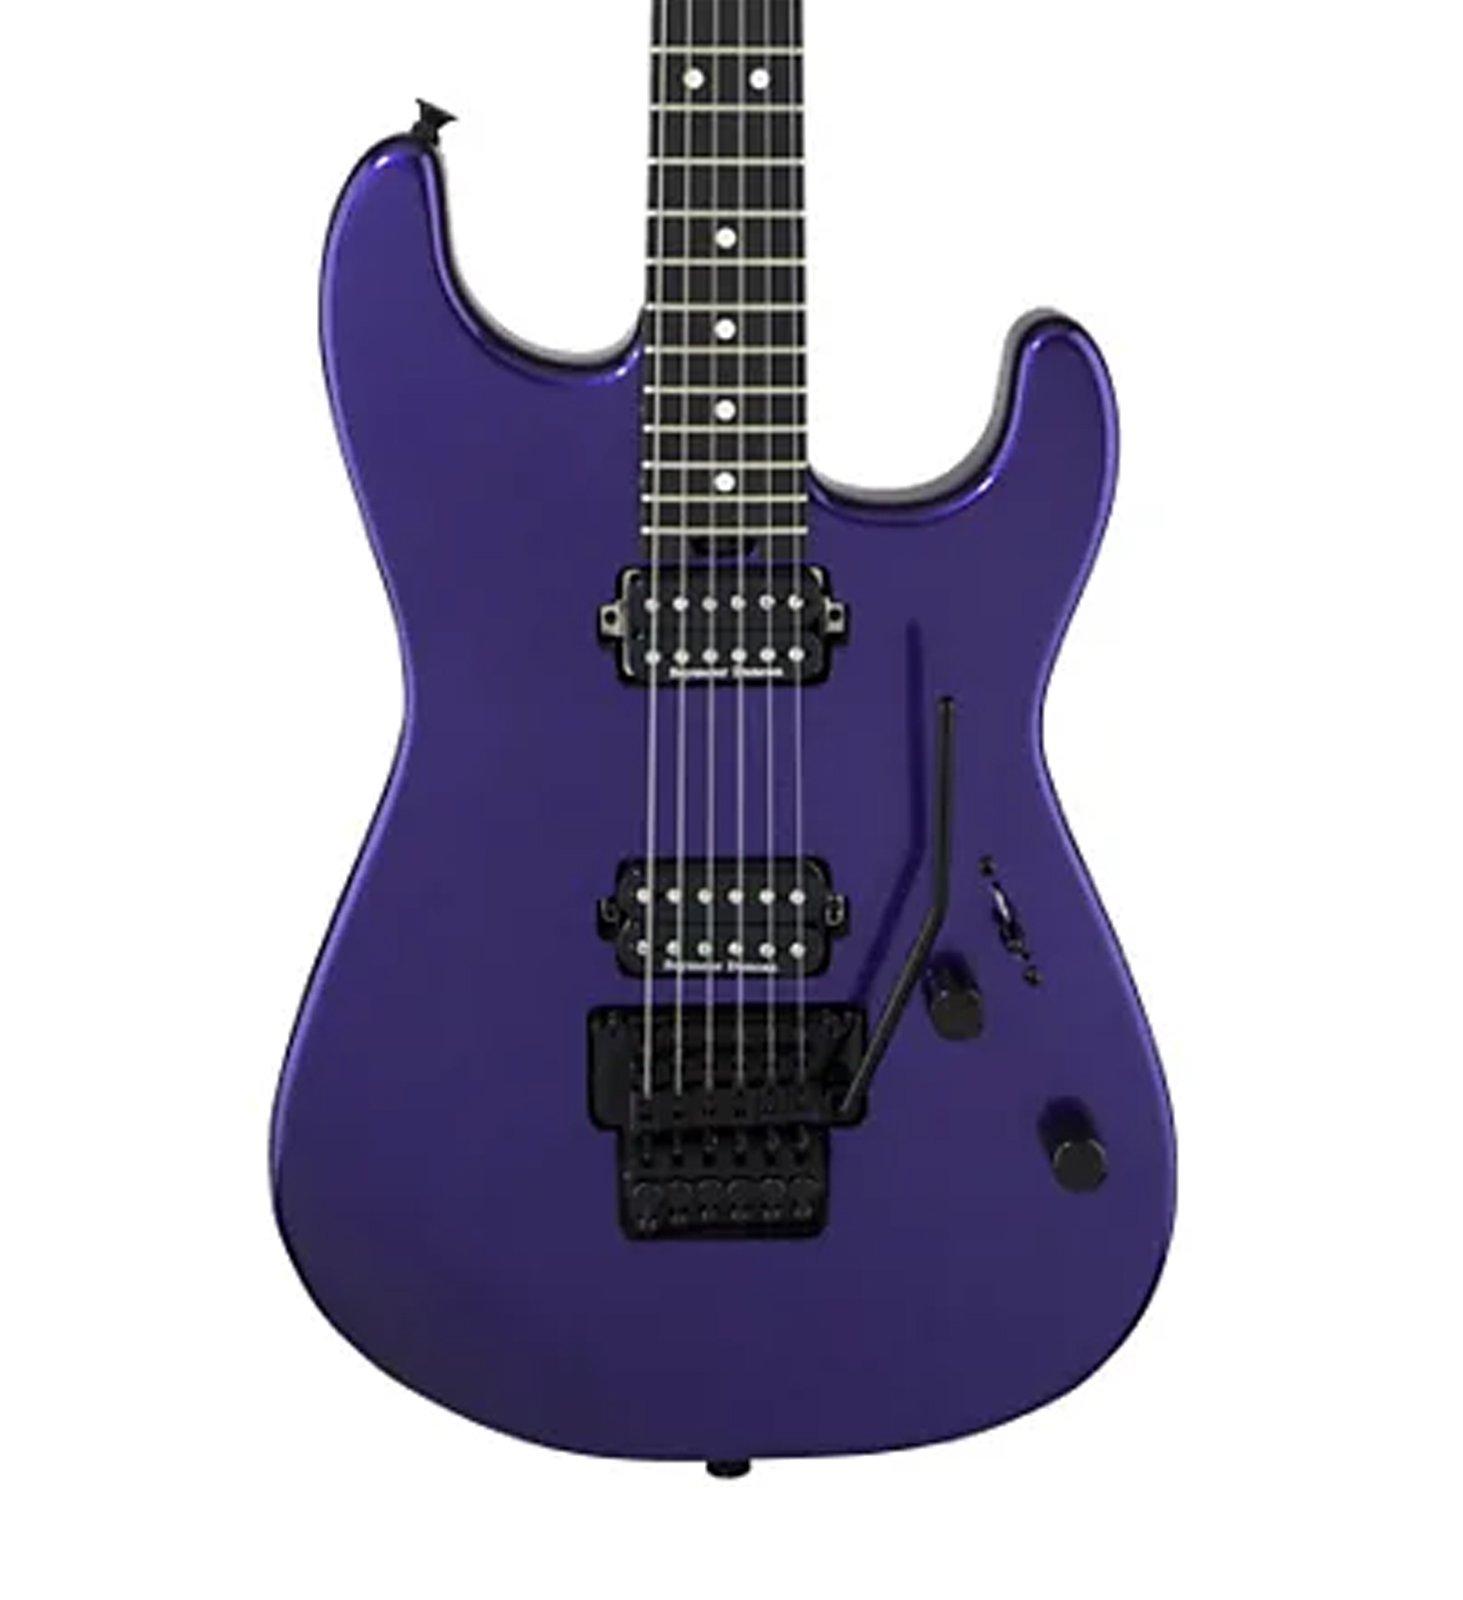 Charvel PM San Dimas 1 Deep Purple Metallic